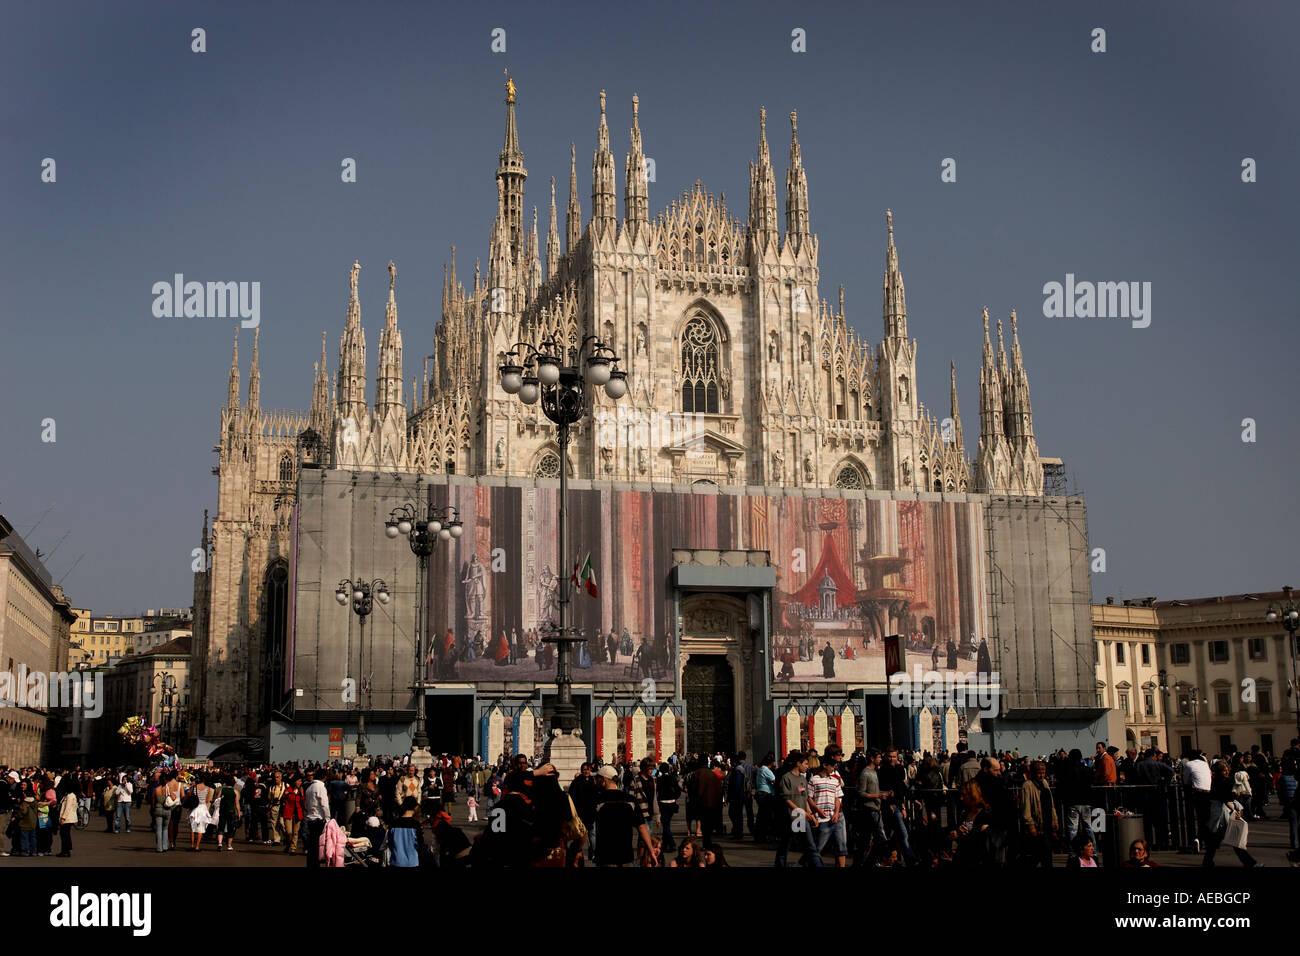 Duomo plaza, Milano italy italia galleria - Stock Image